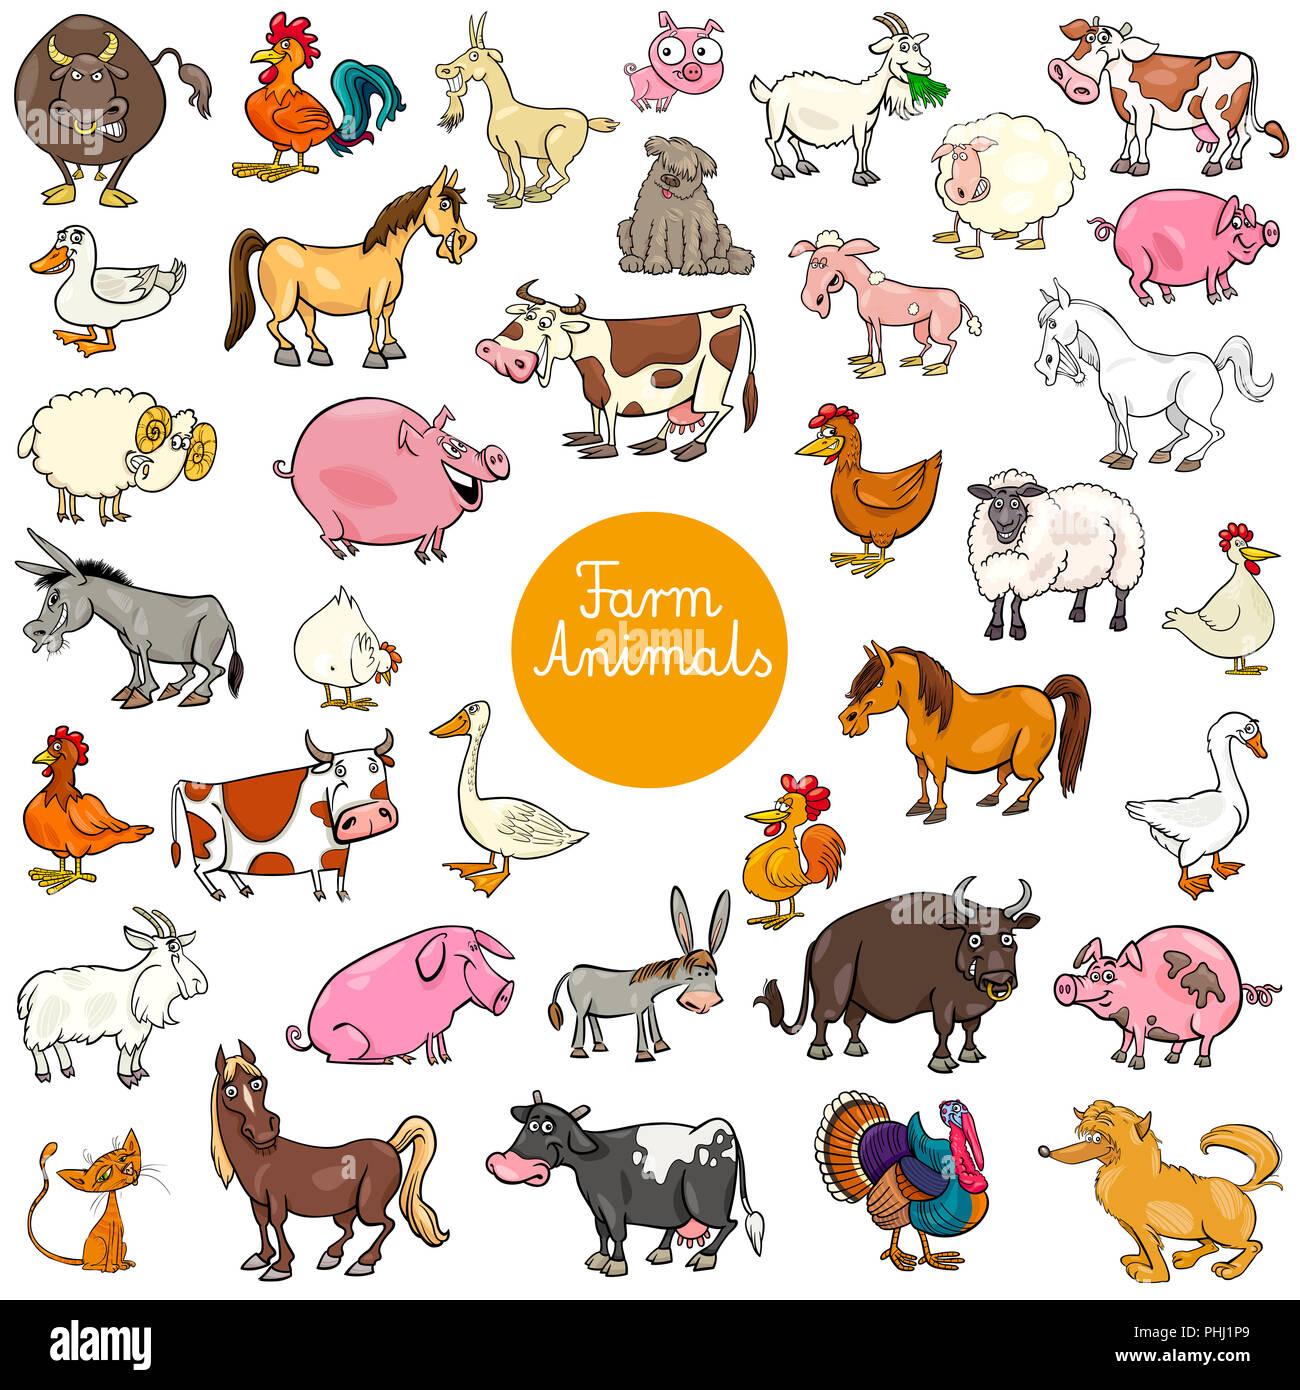 Animal Farm And Cartoon Donkey Stock Photos Amp Animal Farm